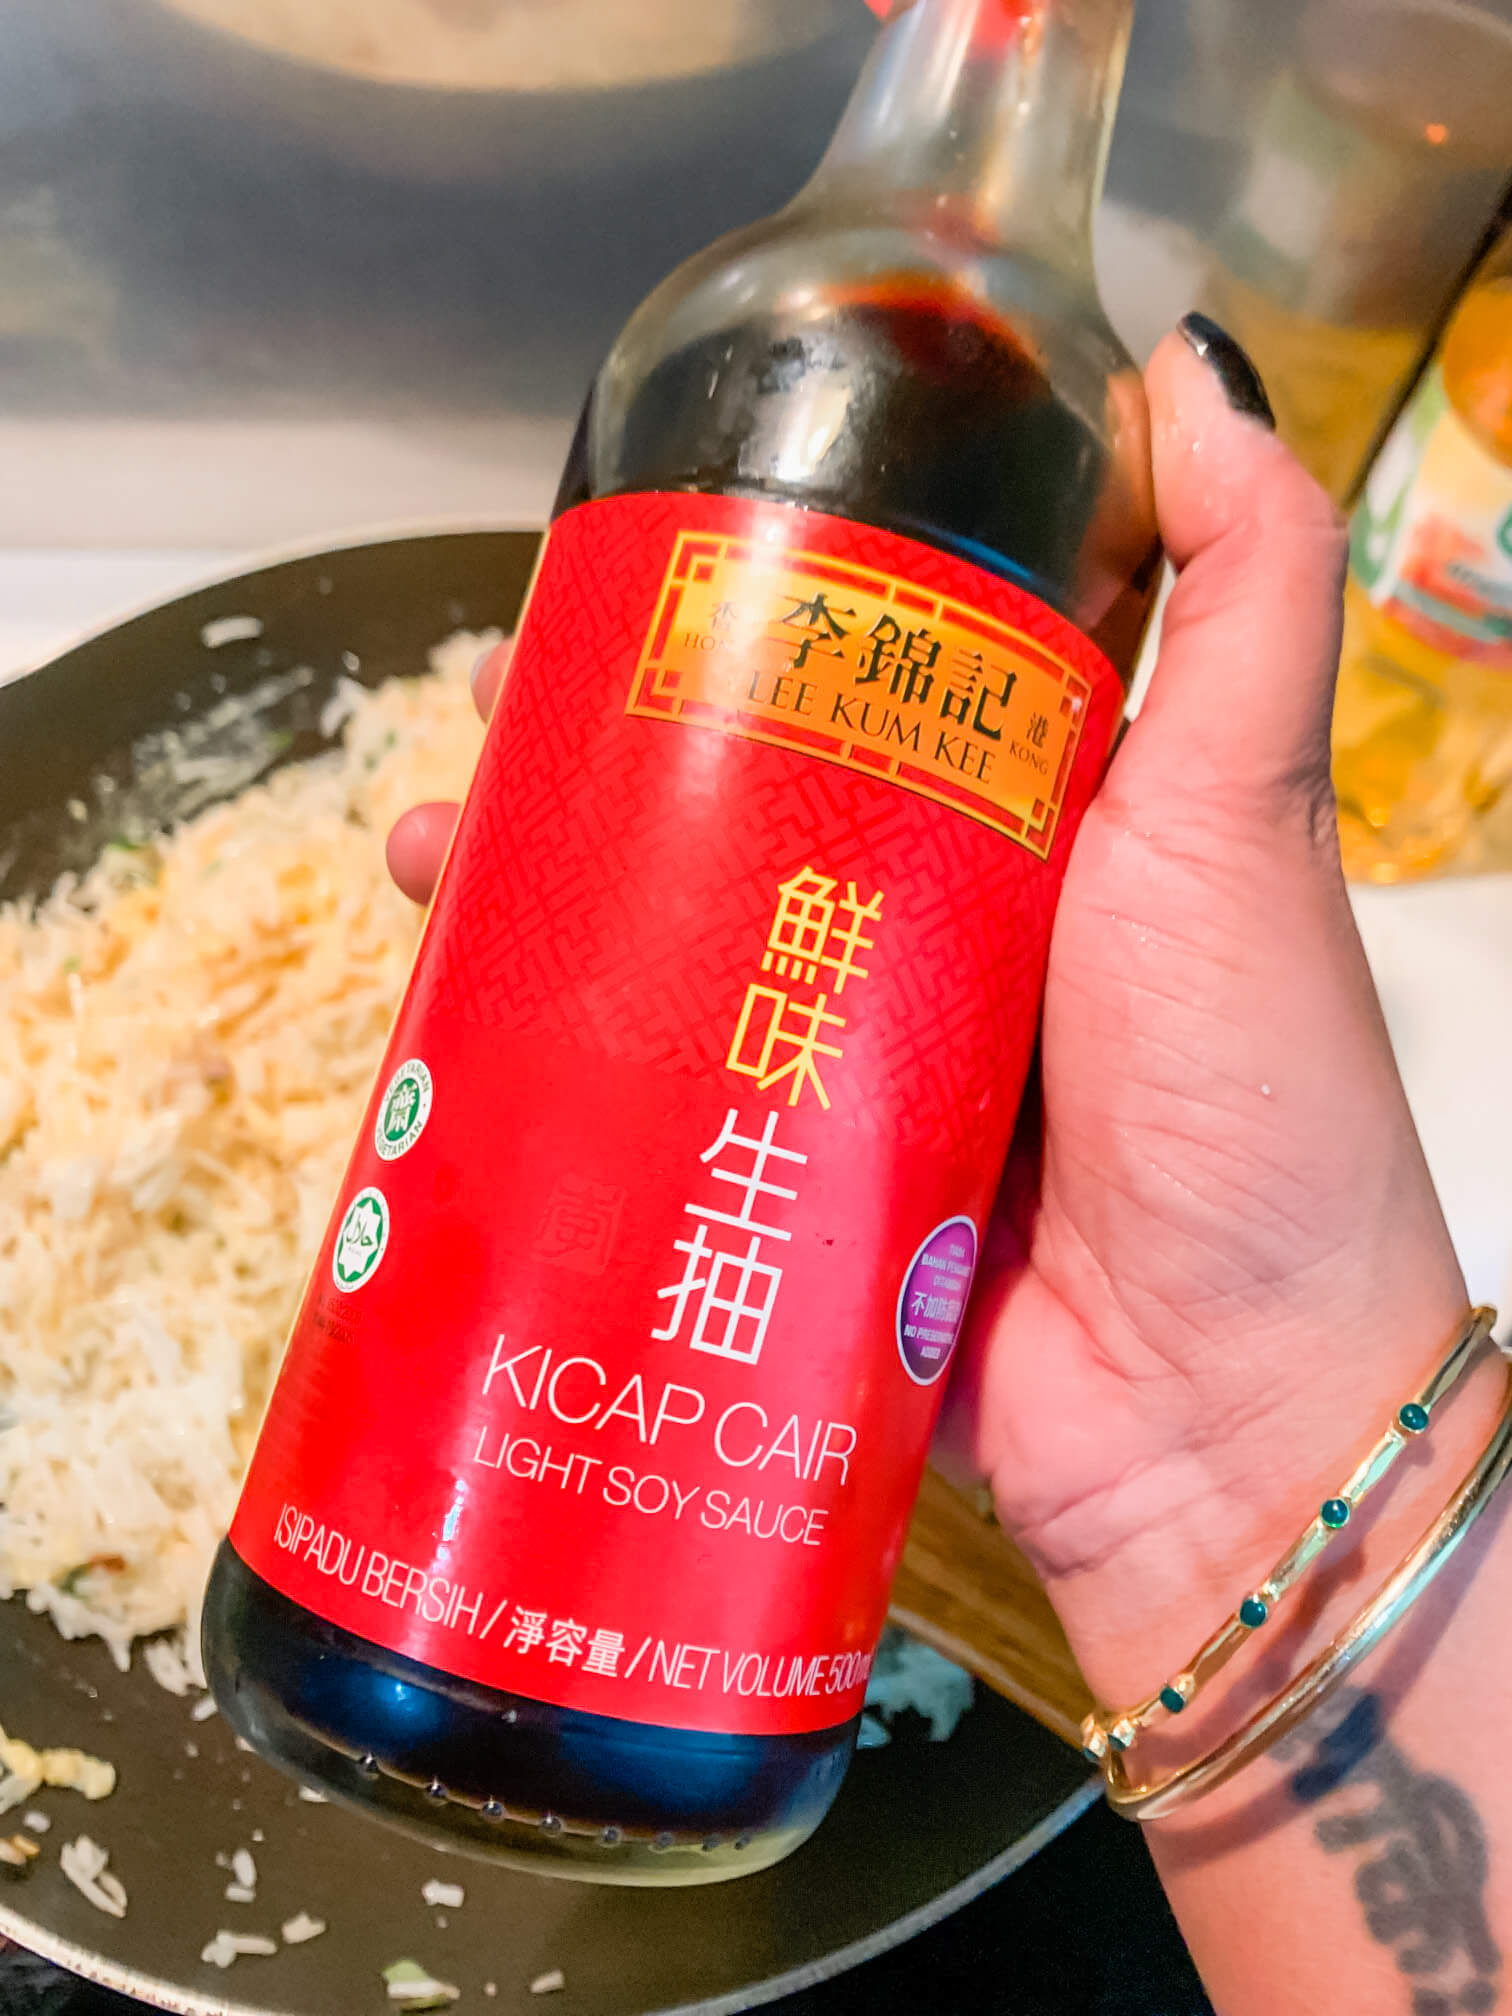 A large bottle of light soy sauce.